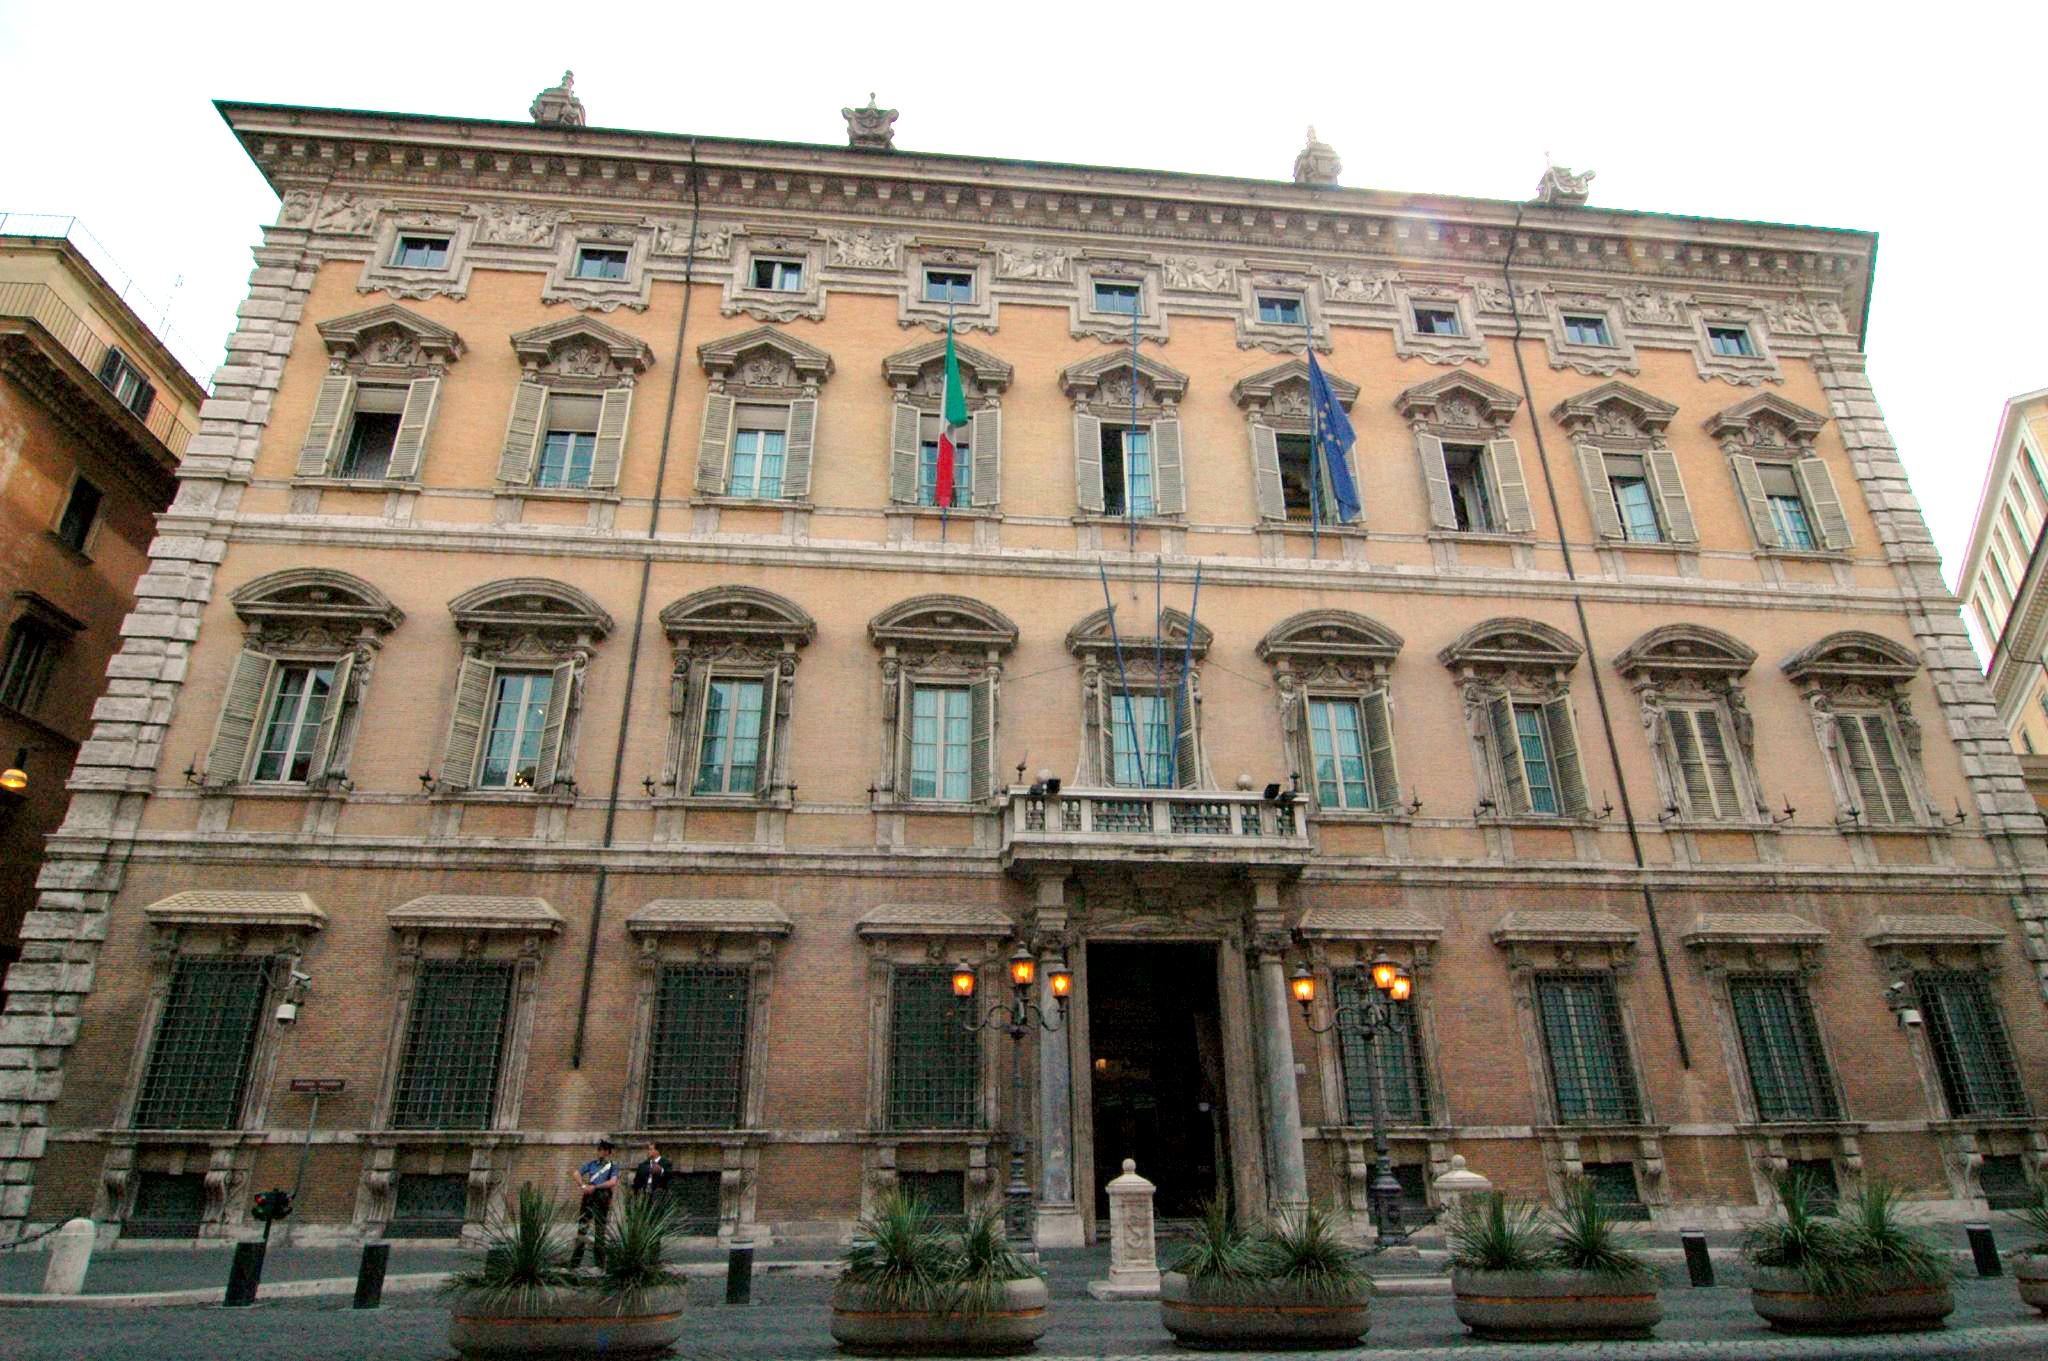 file/ELEMENTO_NEWSLETTER/20119/Senato_Palazzo_Madama_-_Roma.jpg